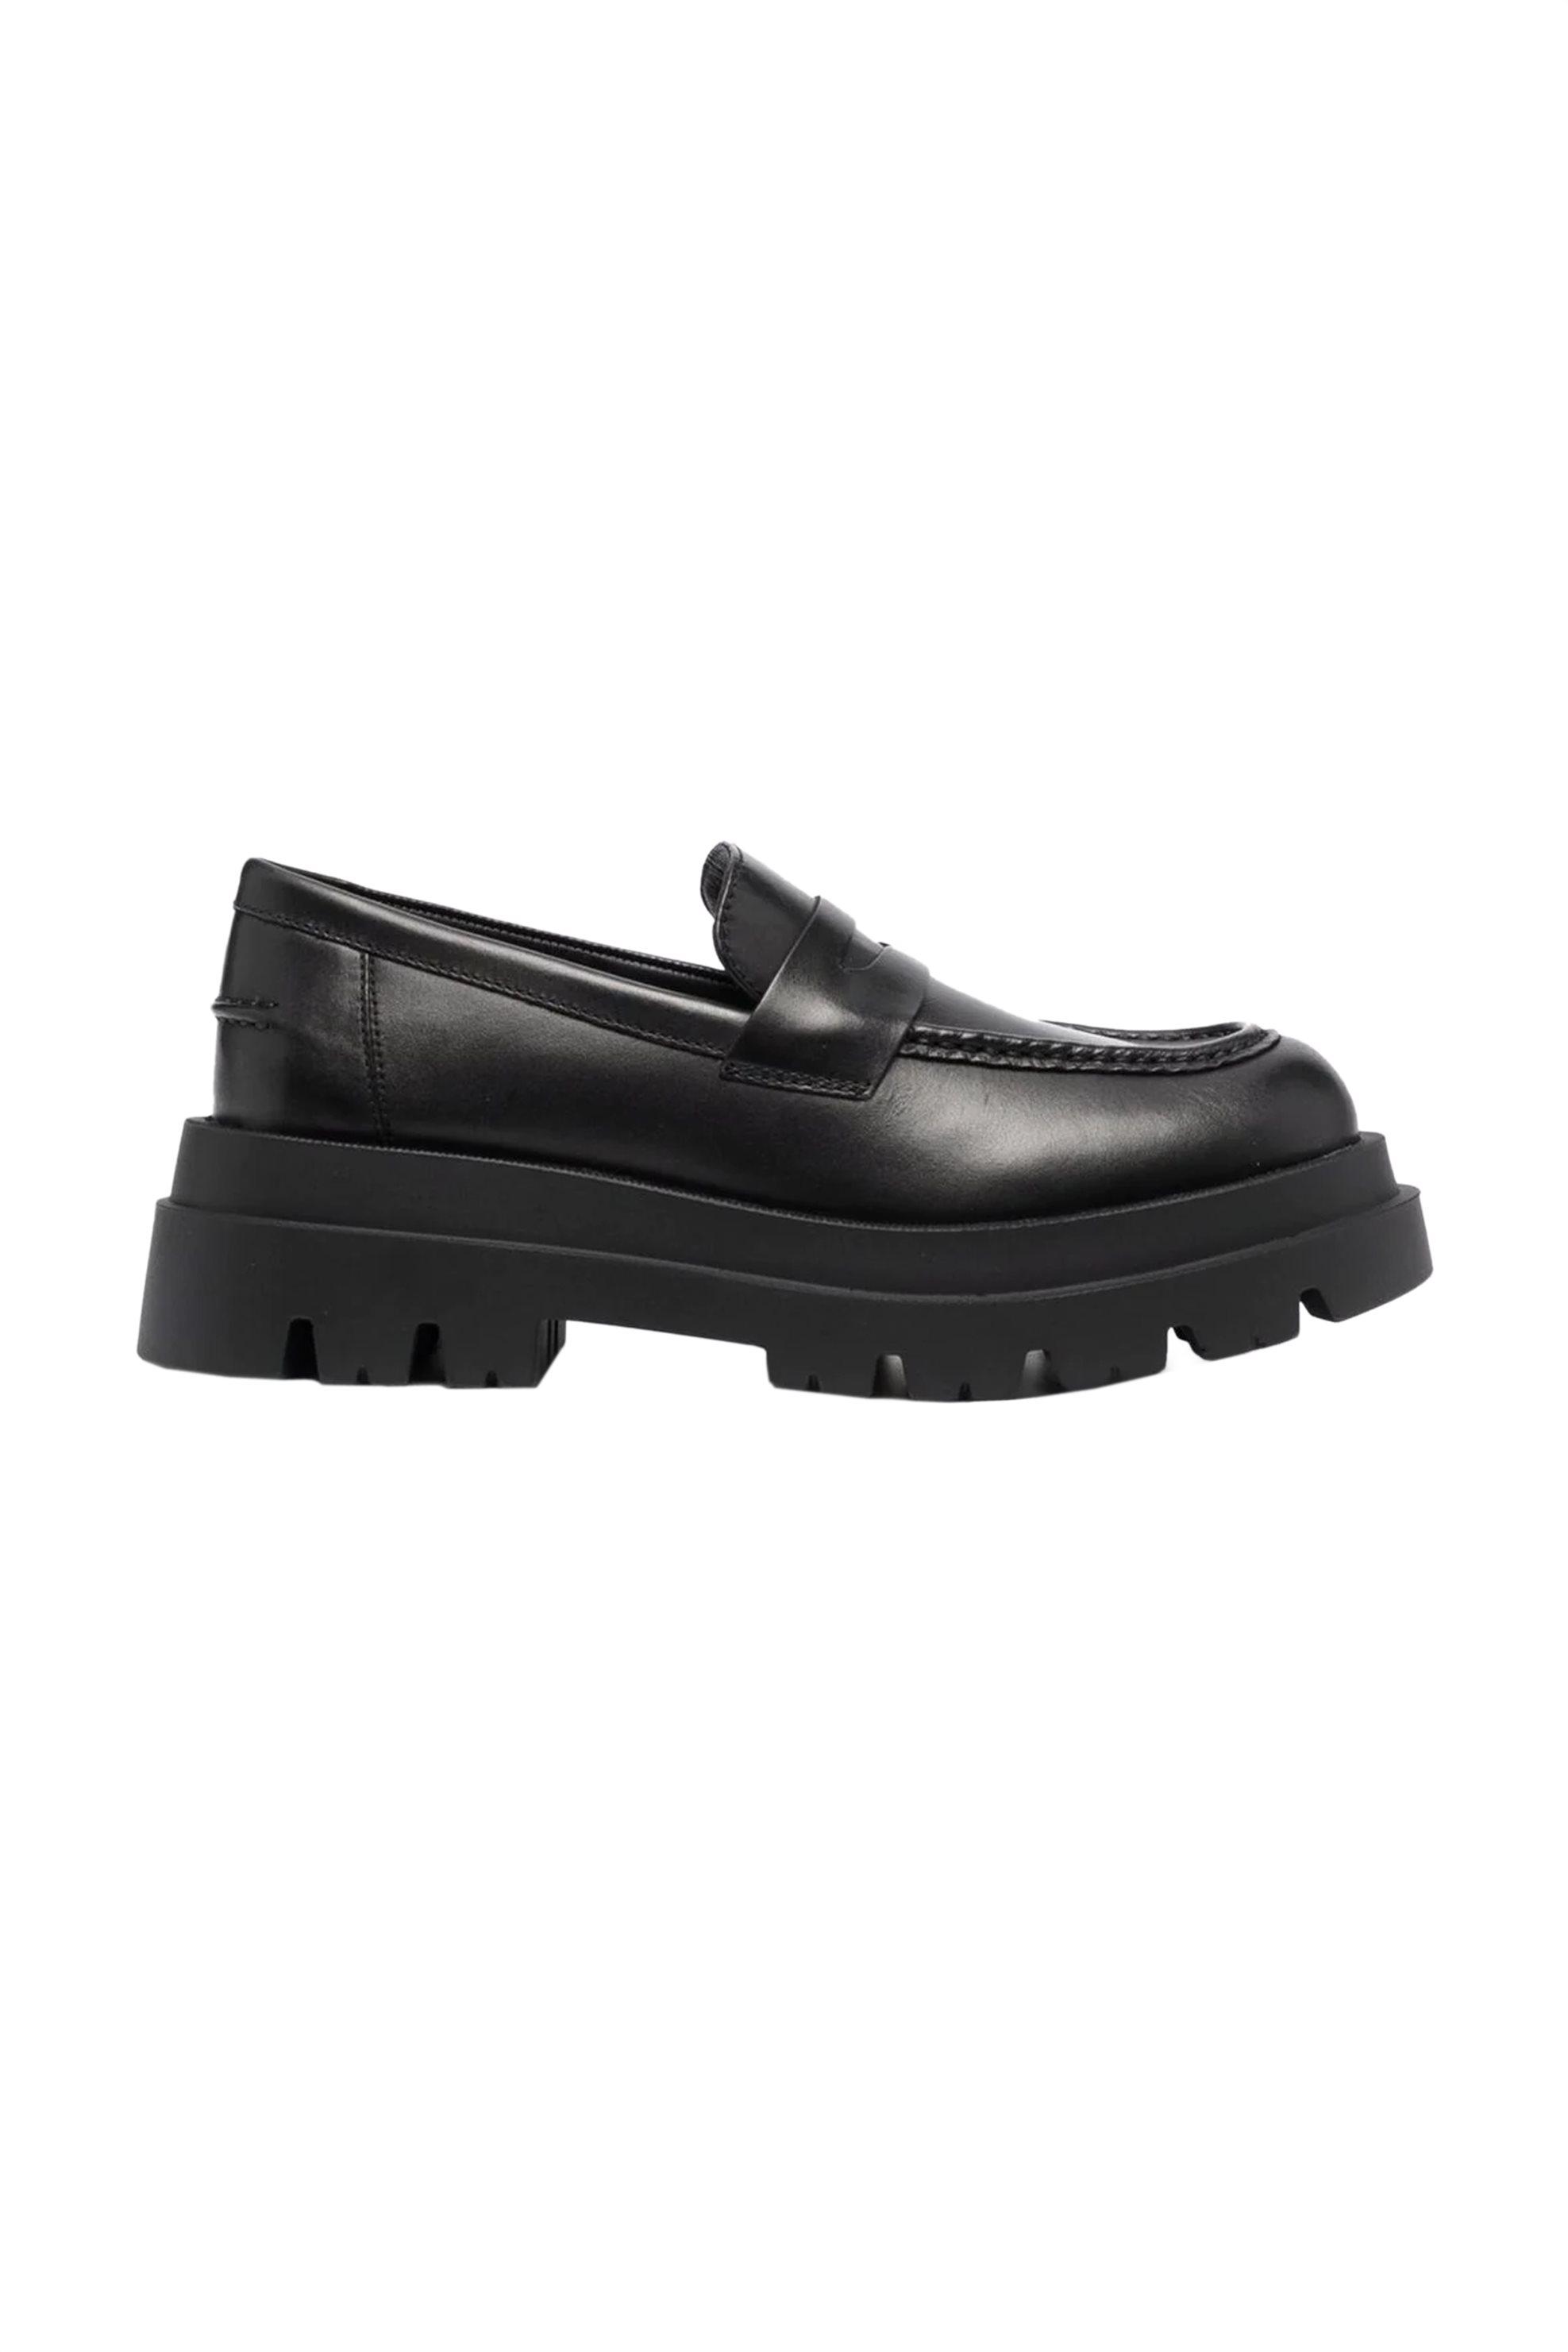 Twinset γυναικεία chunky loafers δερμάτινα – 212TCP234 – Μαύρο